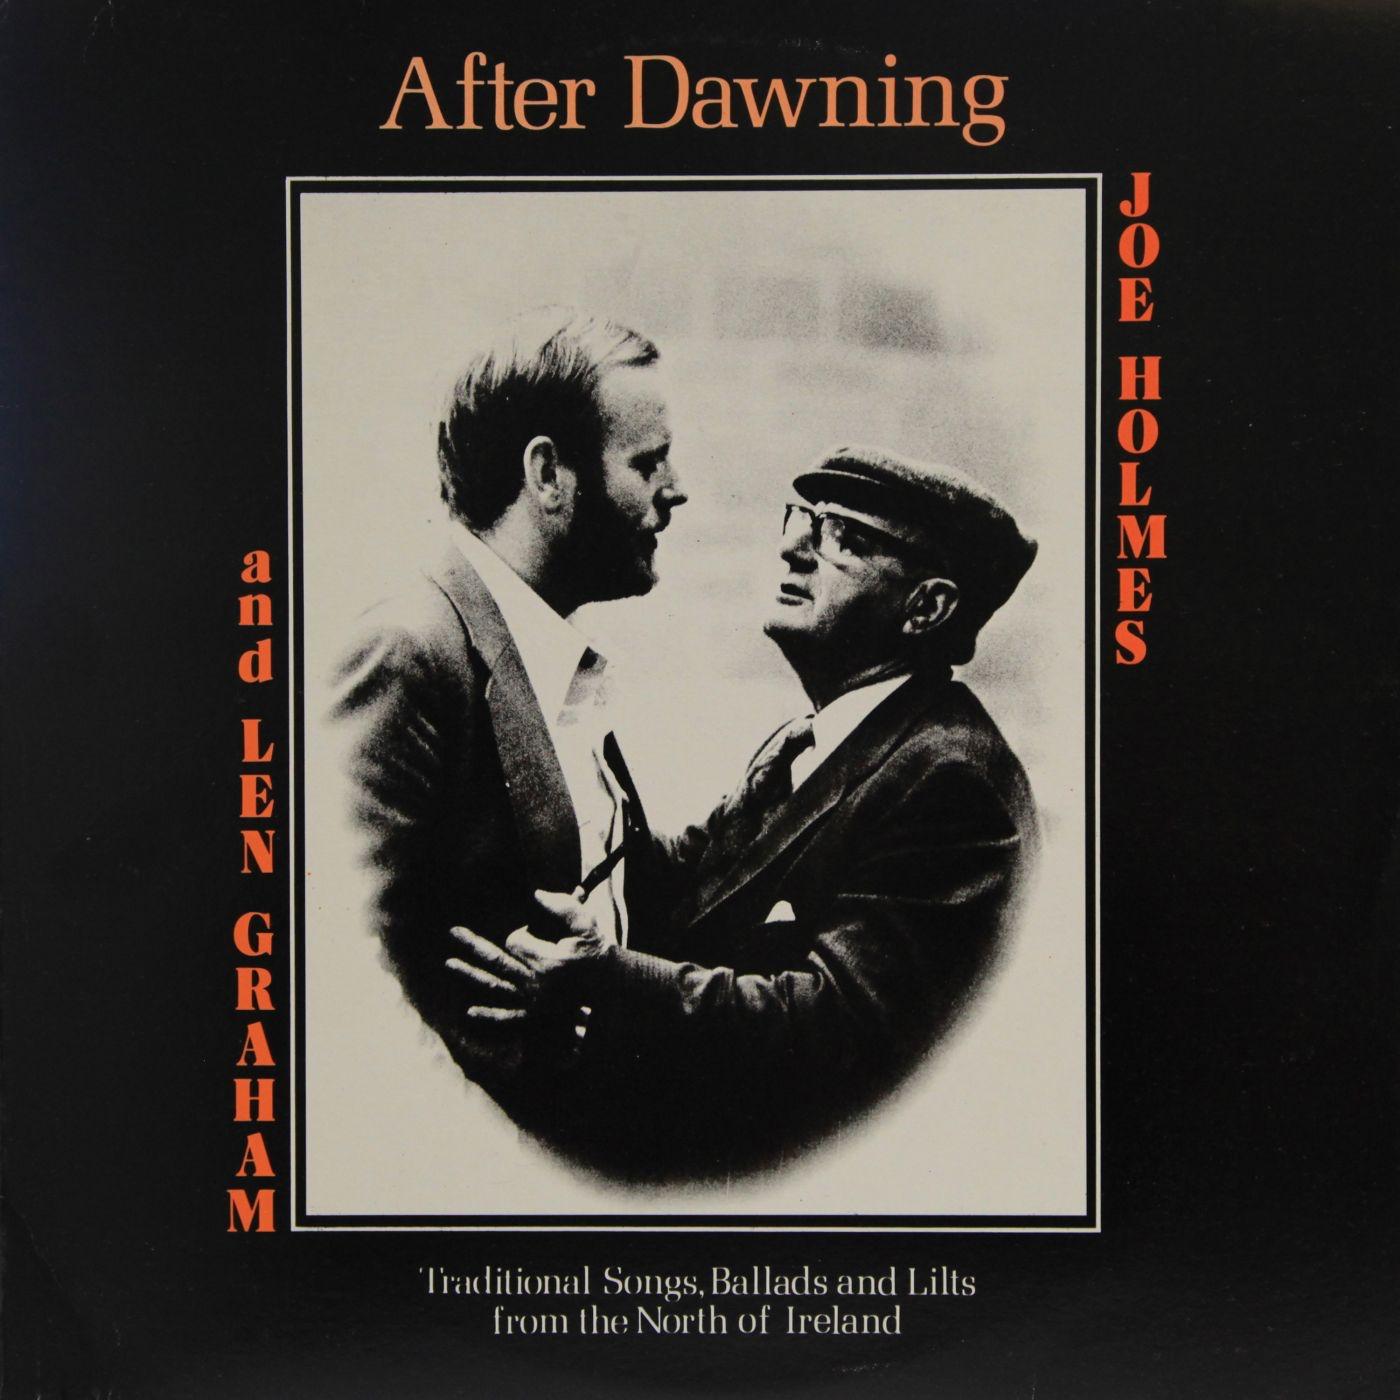 Joe Holmes and Len Graham - After Dawning